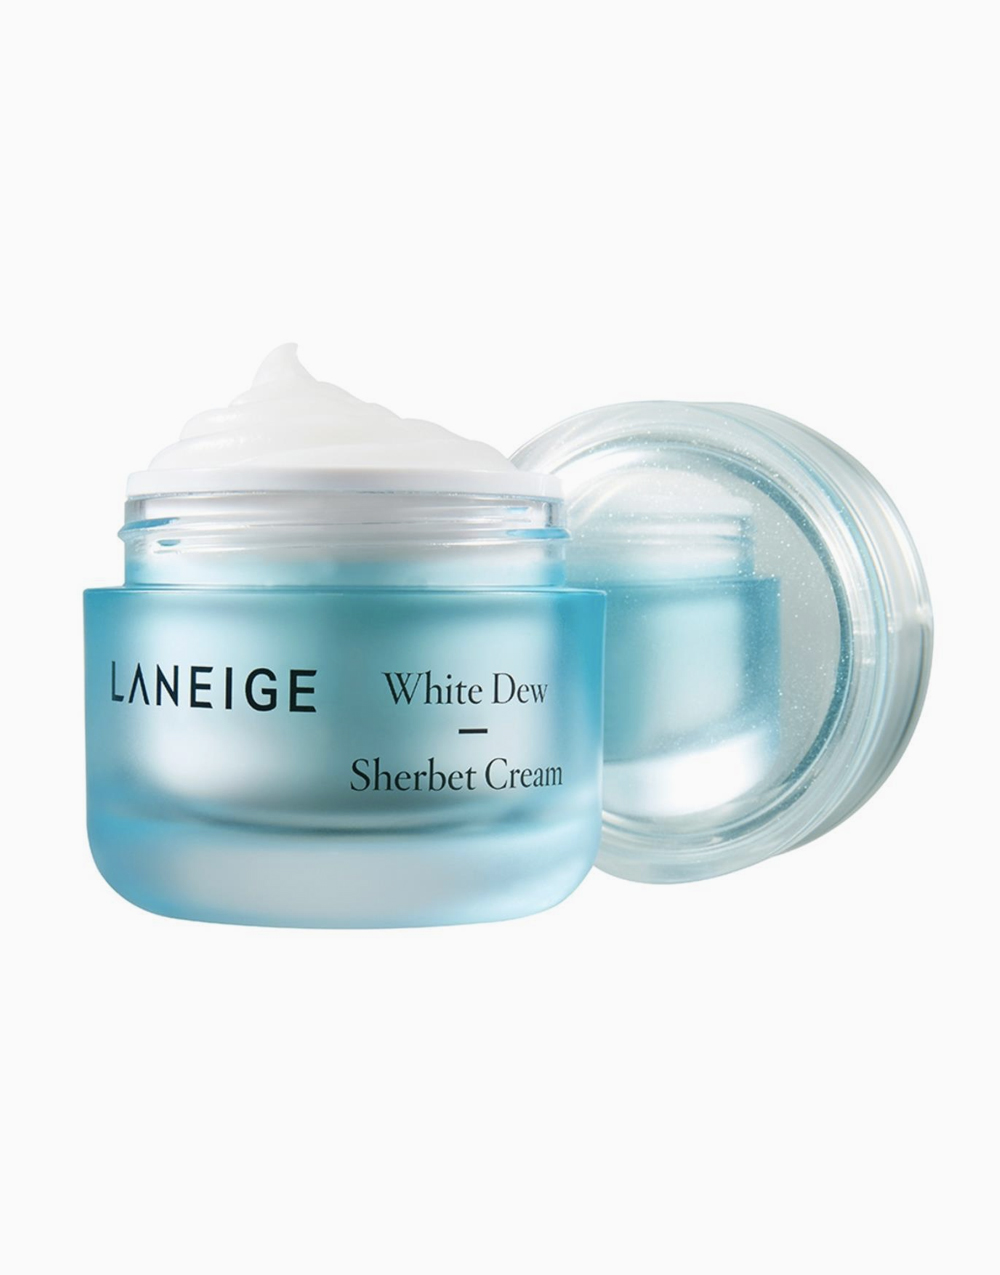 White Dew Sherbet Cream by Laneige